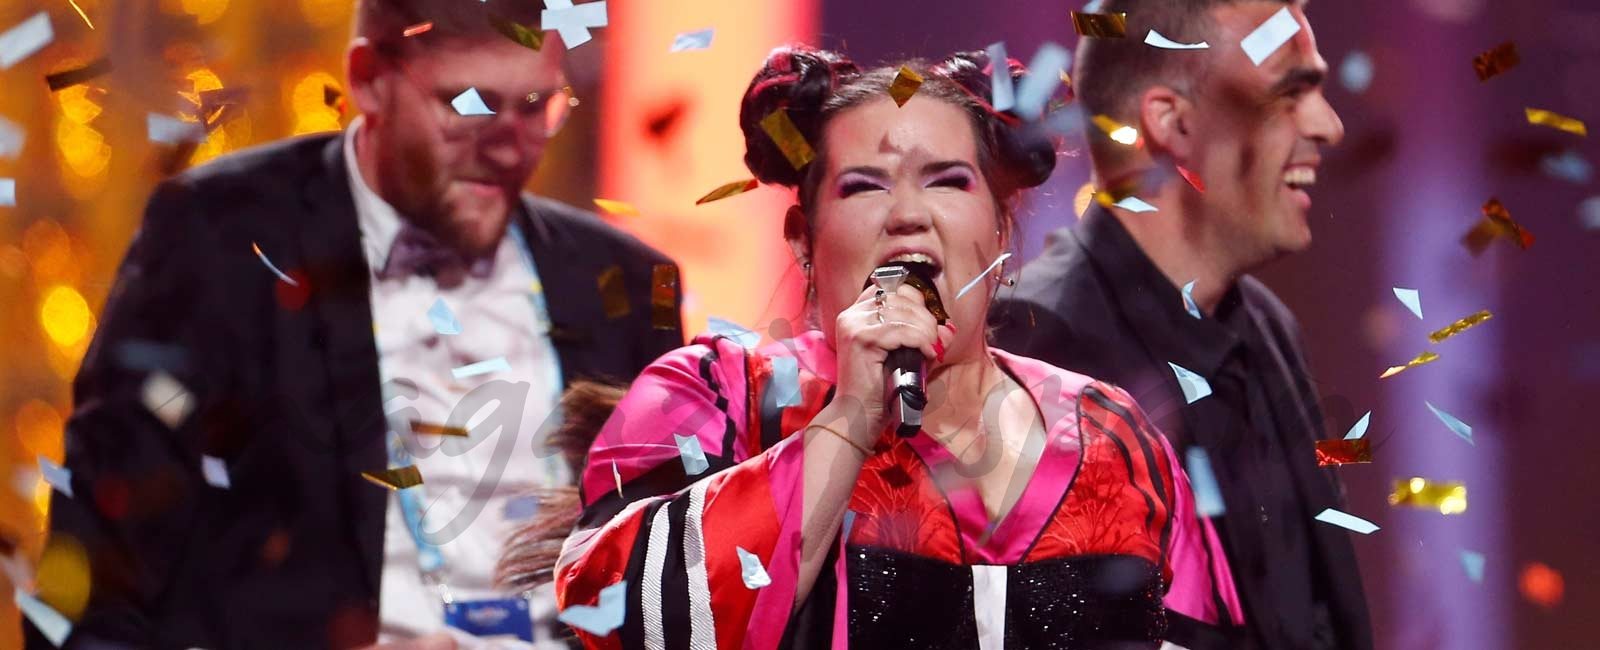 Netta Barzilai, de Israel, la gran triunfadora de Eurovisión 2018